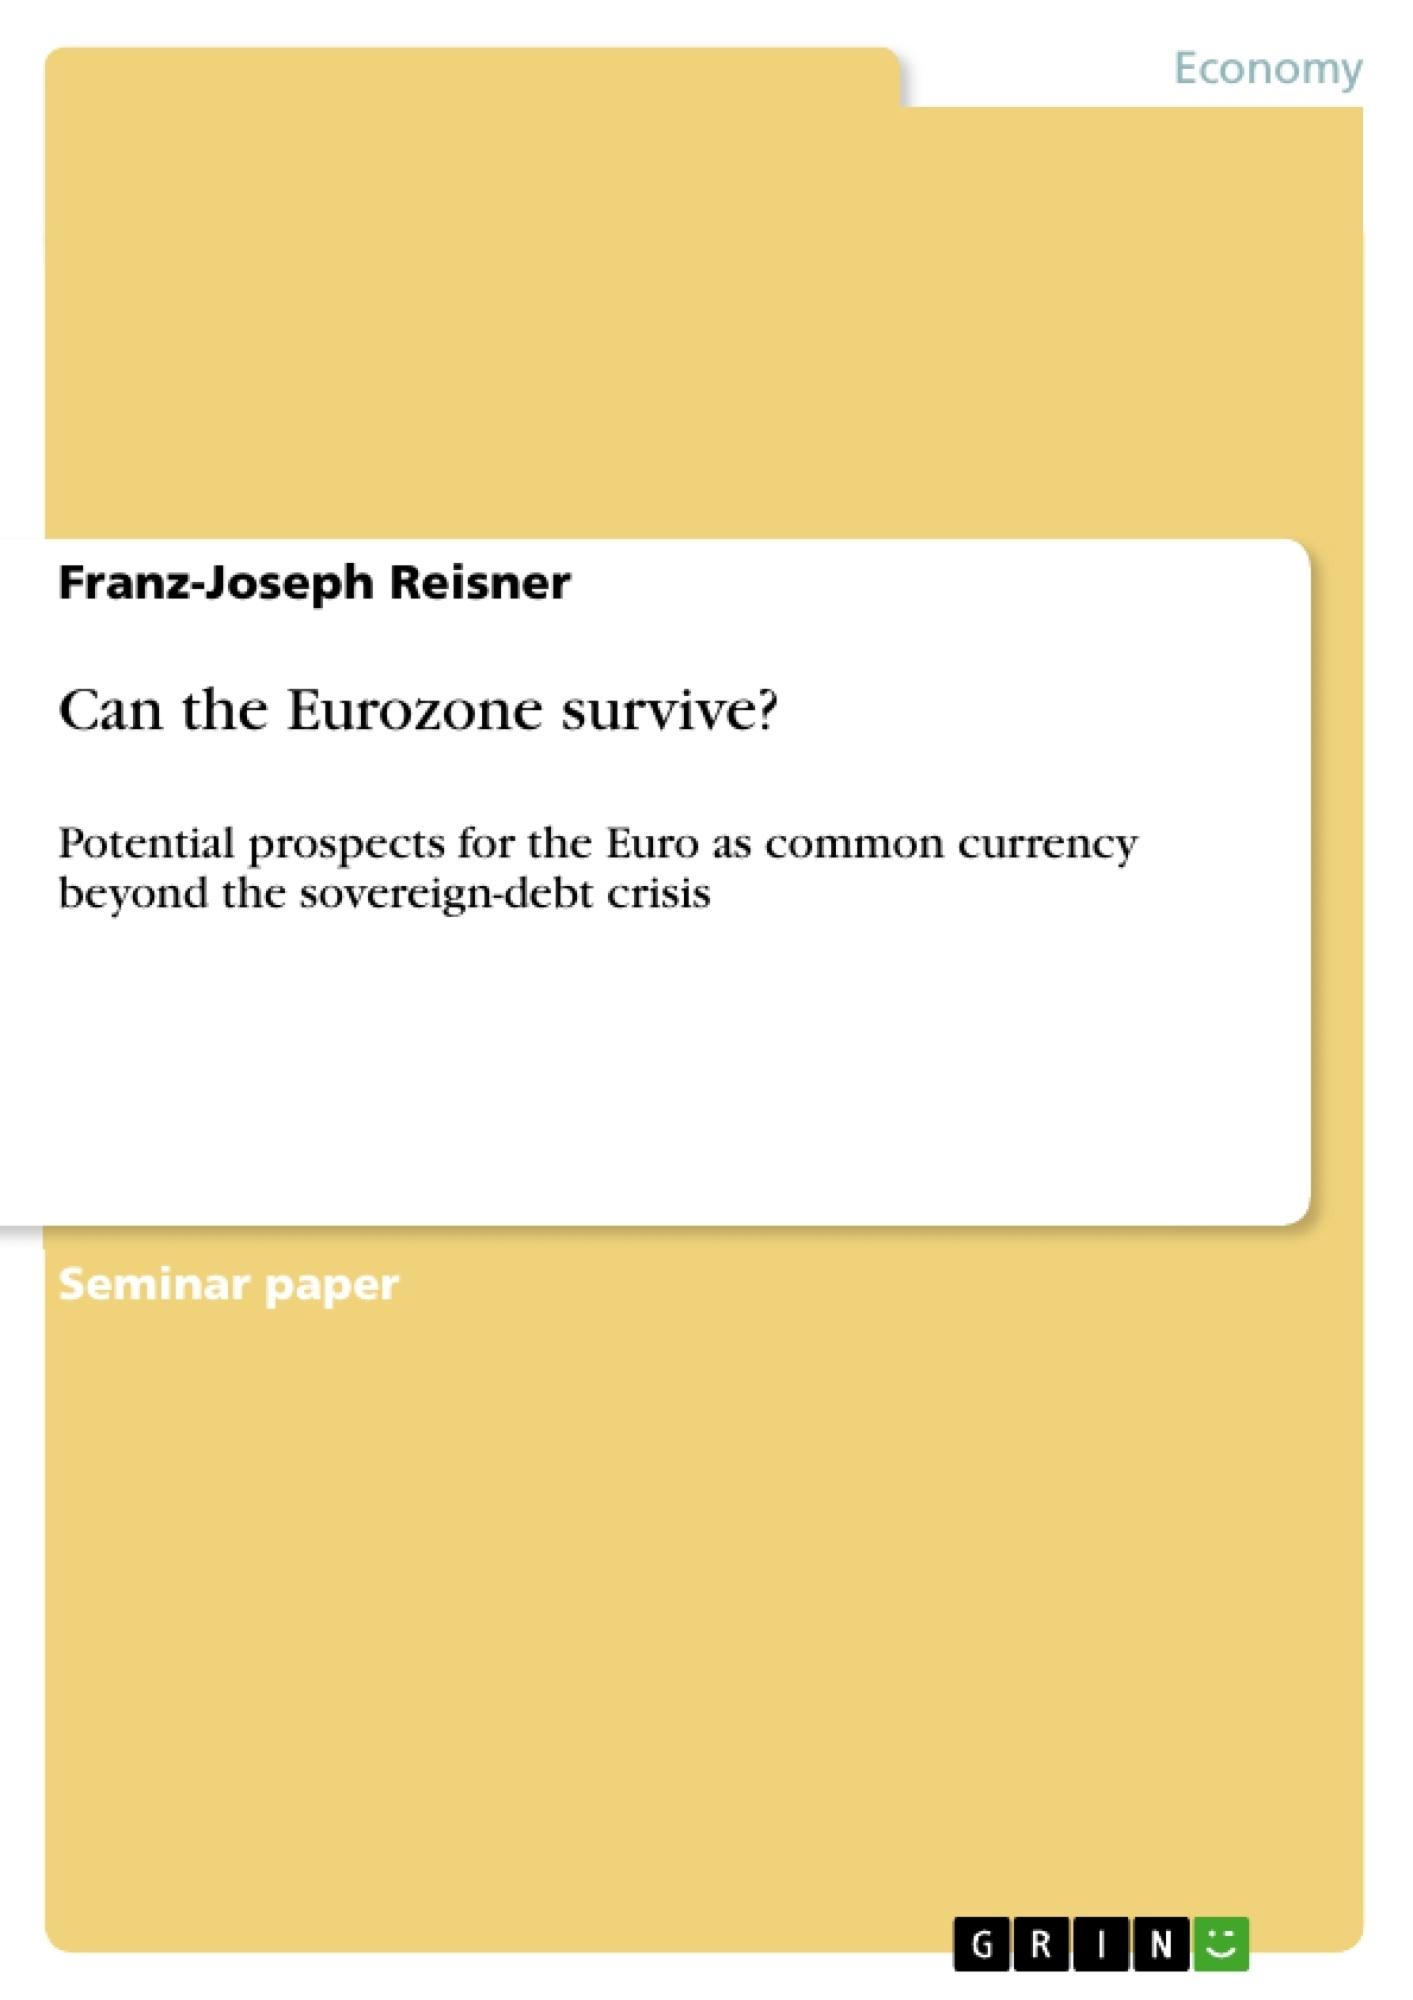 Title: Can the Eurozone survive?